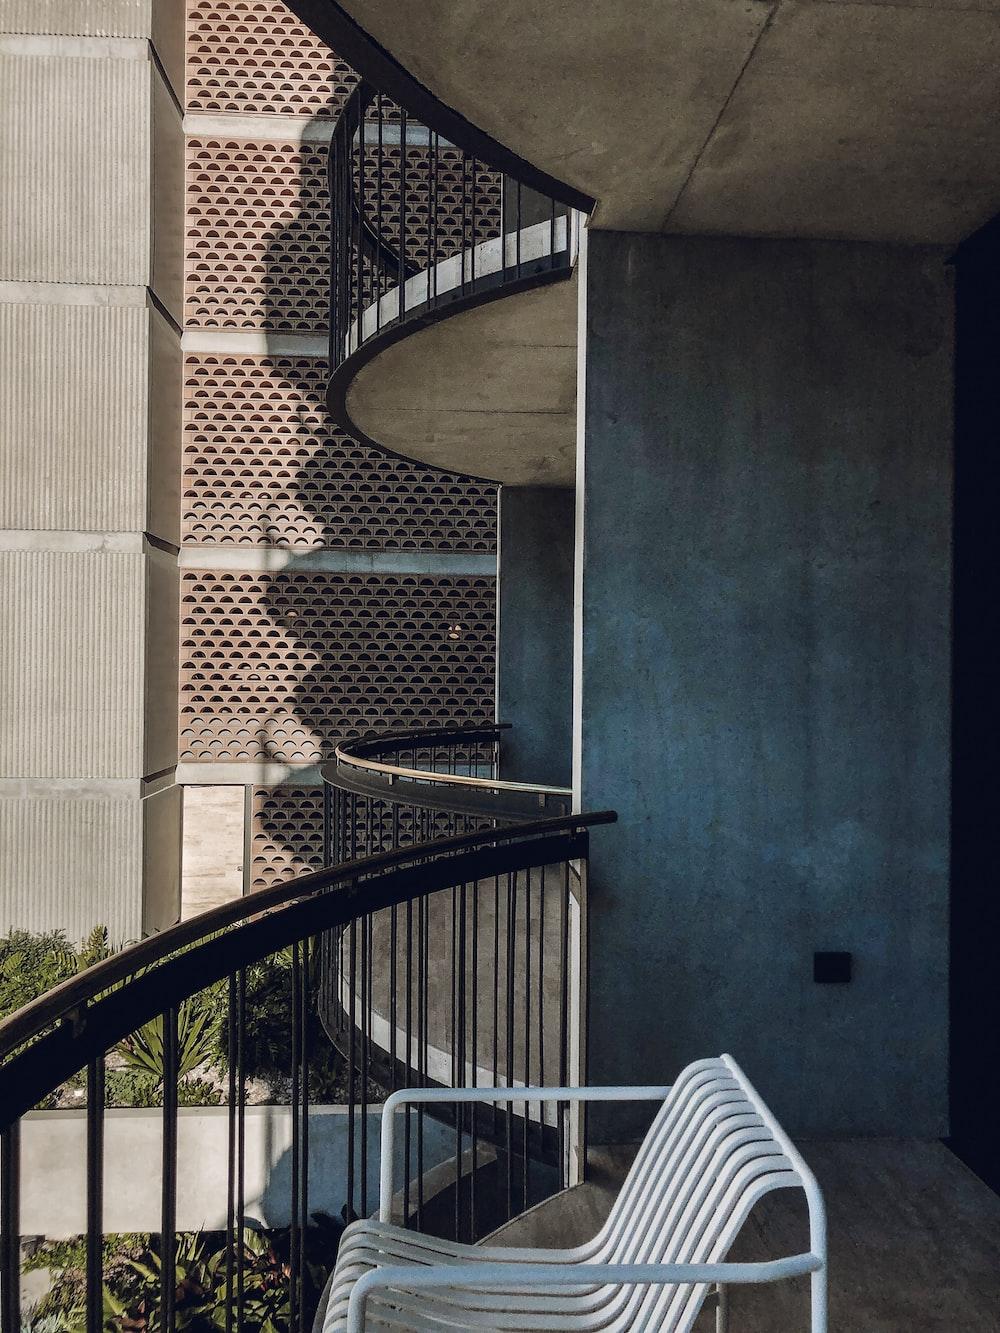 black metal spiral staircase near brown concrete building during daytime